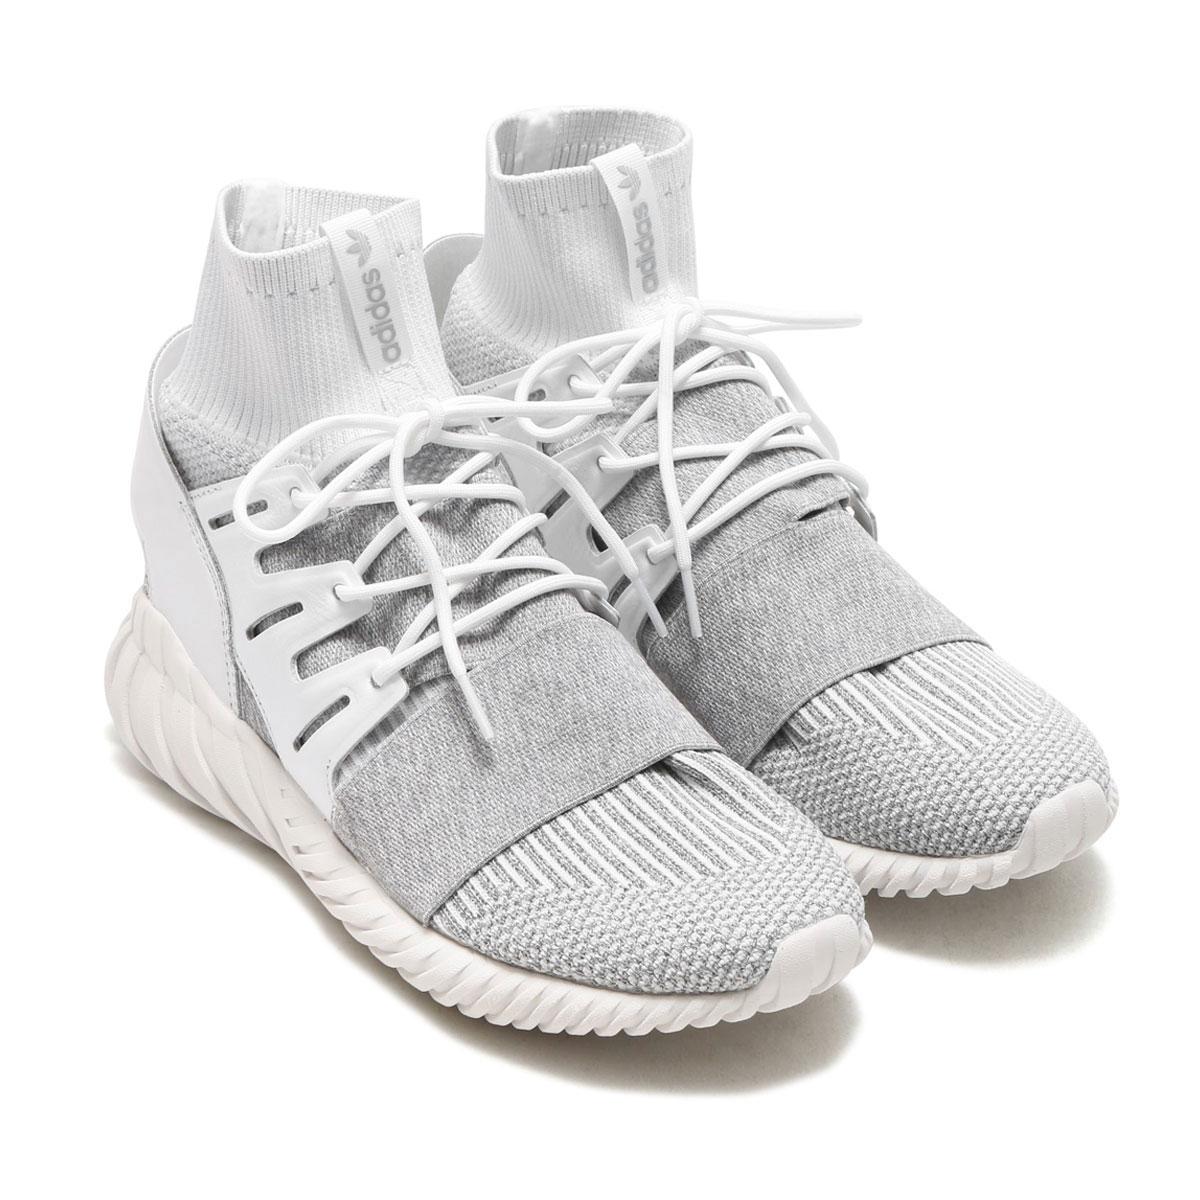 adidas Originals TUBULAR DOOM PK(アディダス オリジナルス チュブラー ドーム PK)(Running White/Running White/Clear Grey) 【メンズ スニーカー】17FW-I